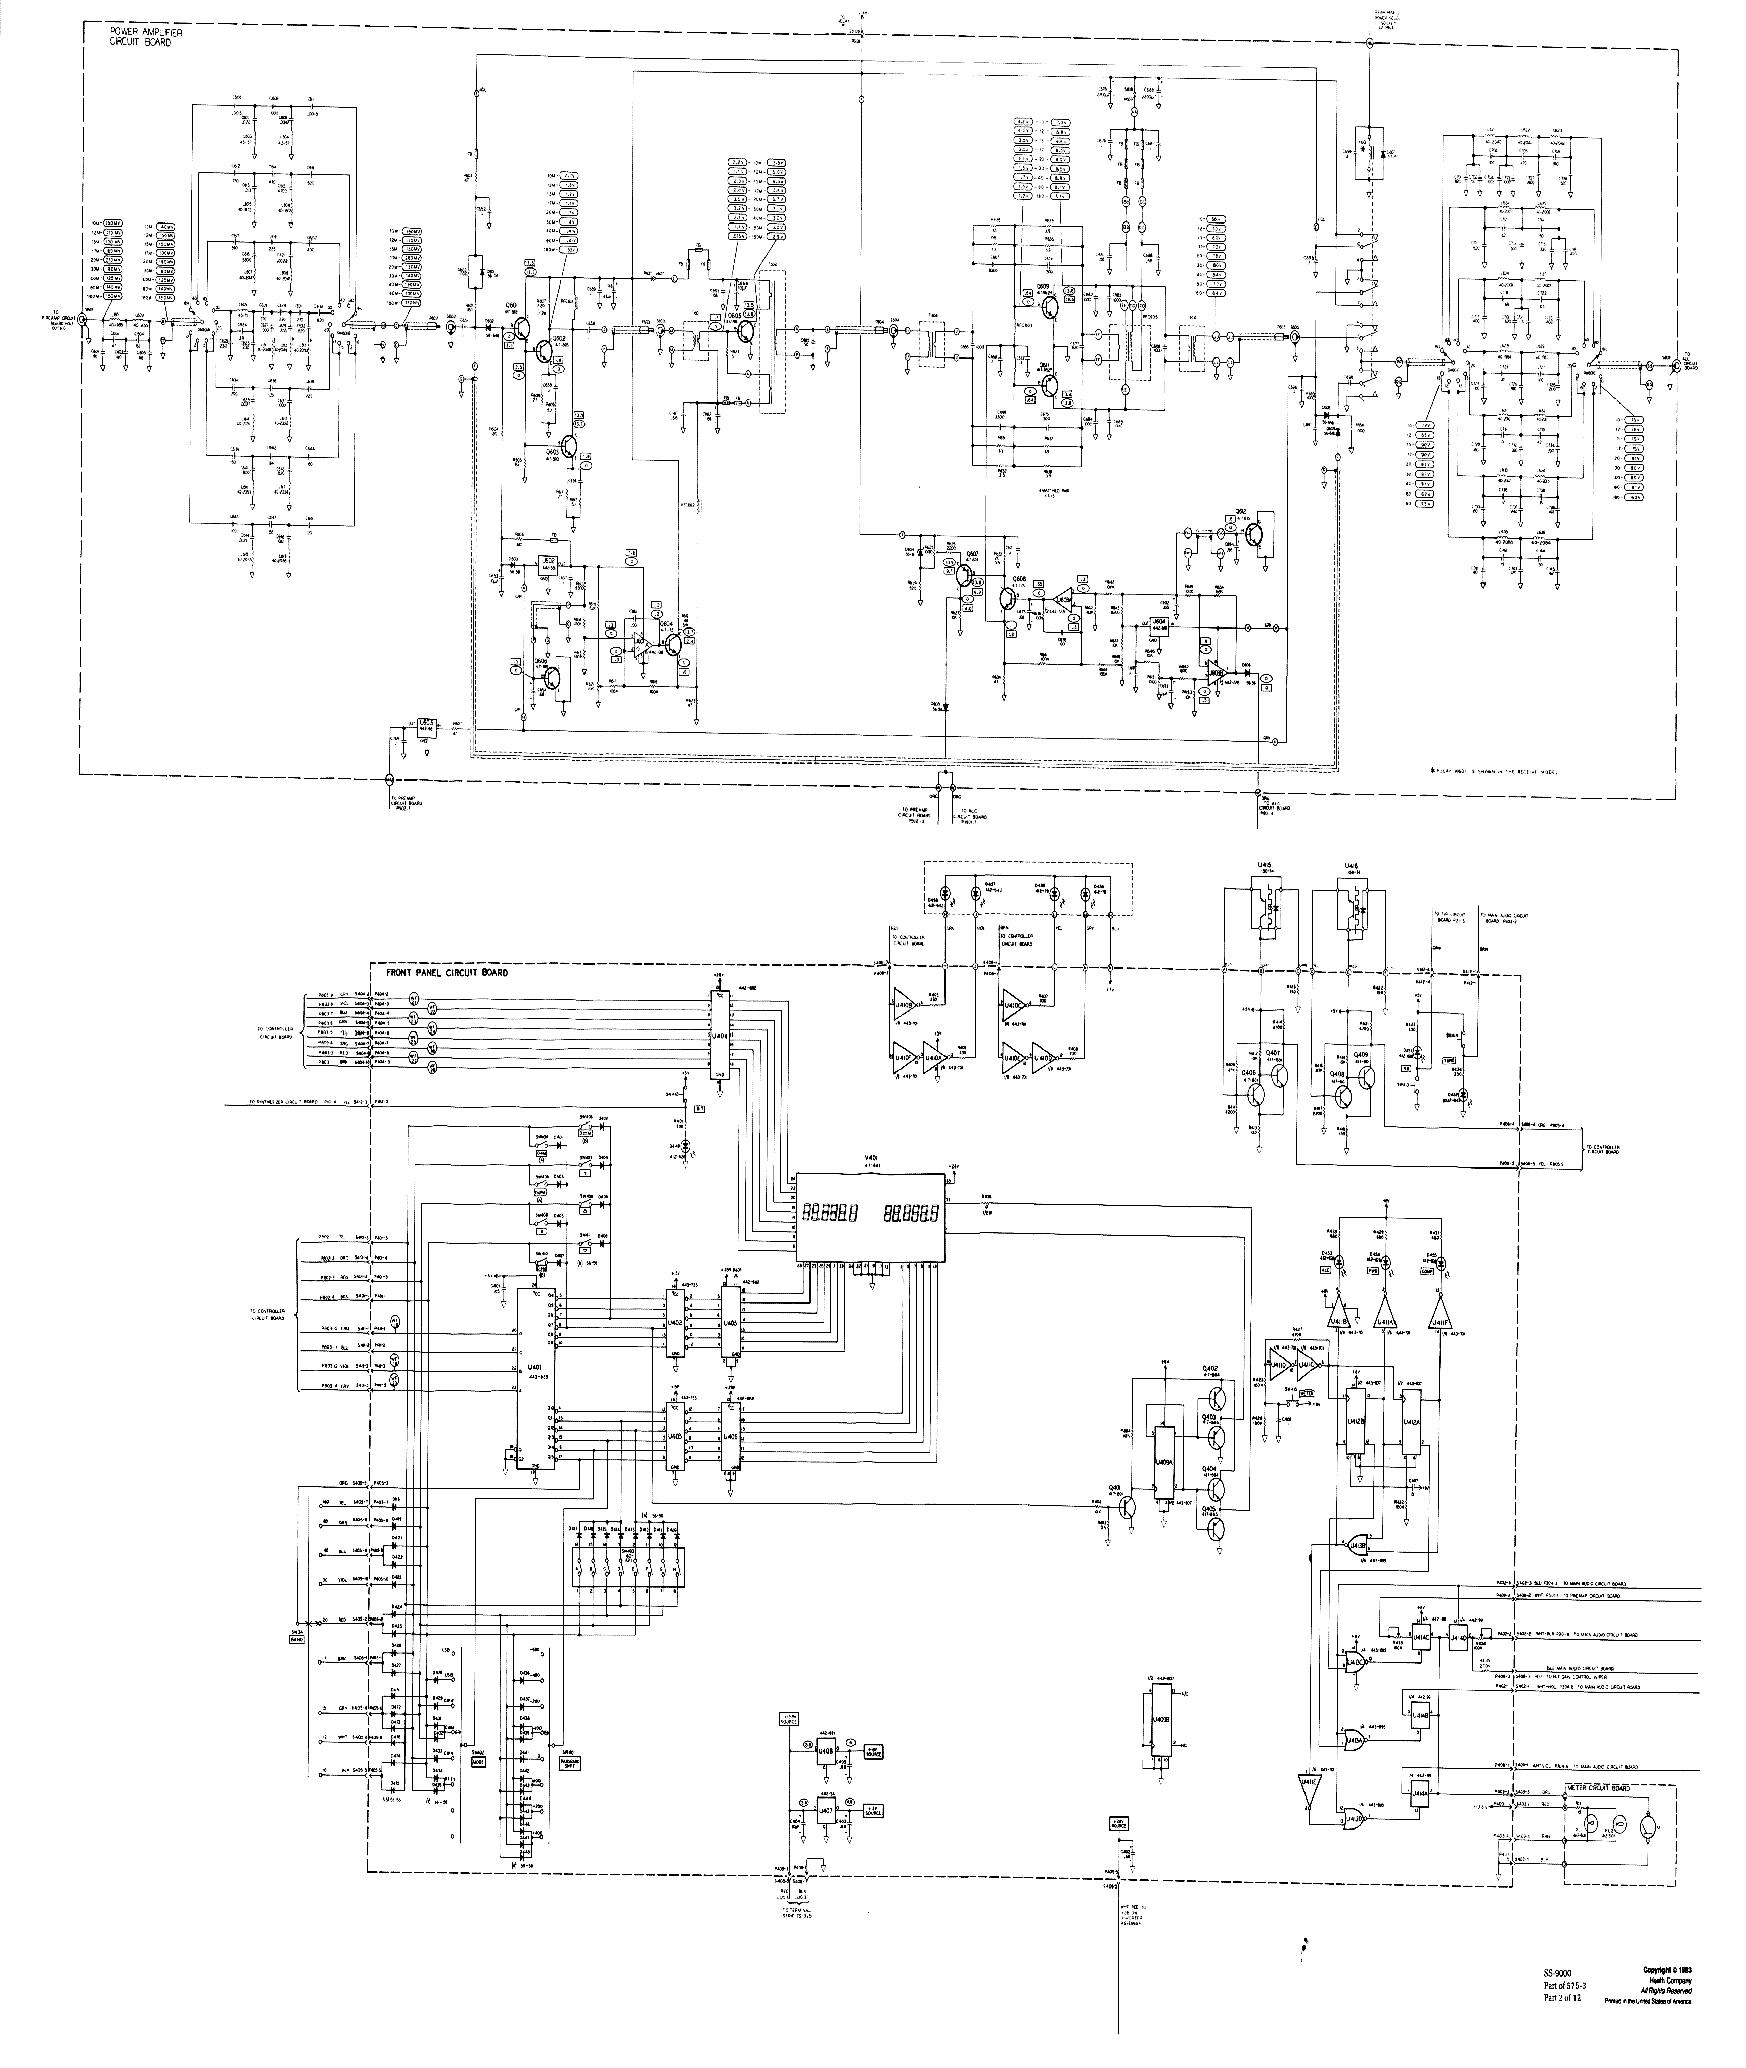 HEATHKIT SS-9000 AMATEUR TRANSCEIVER SCH Service Manual